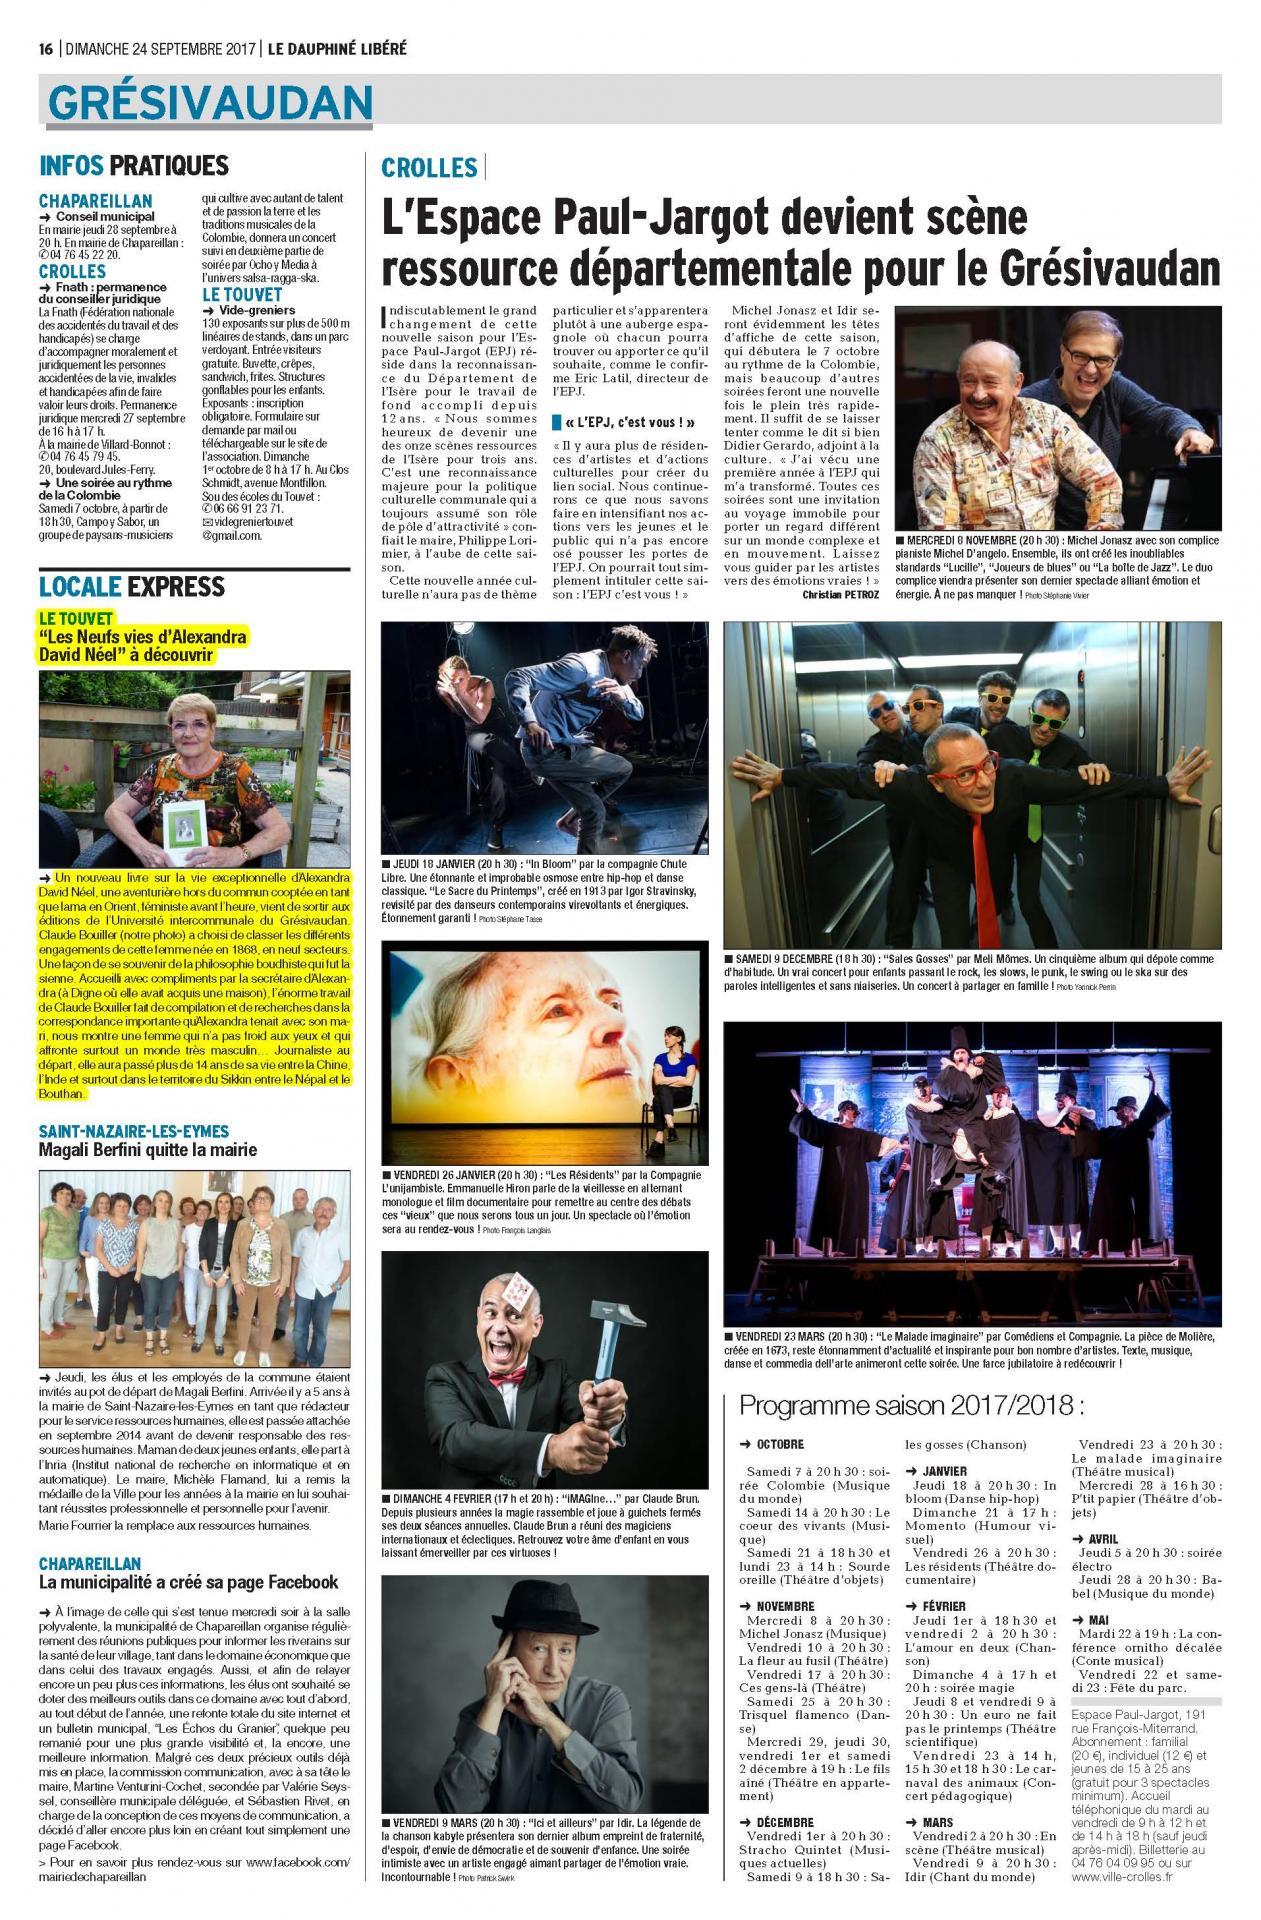 Pdf 2017 09 24 page 16 edition grenoble gresivaudan